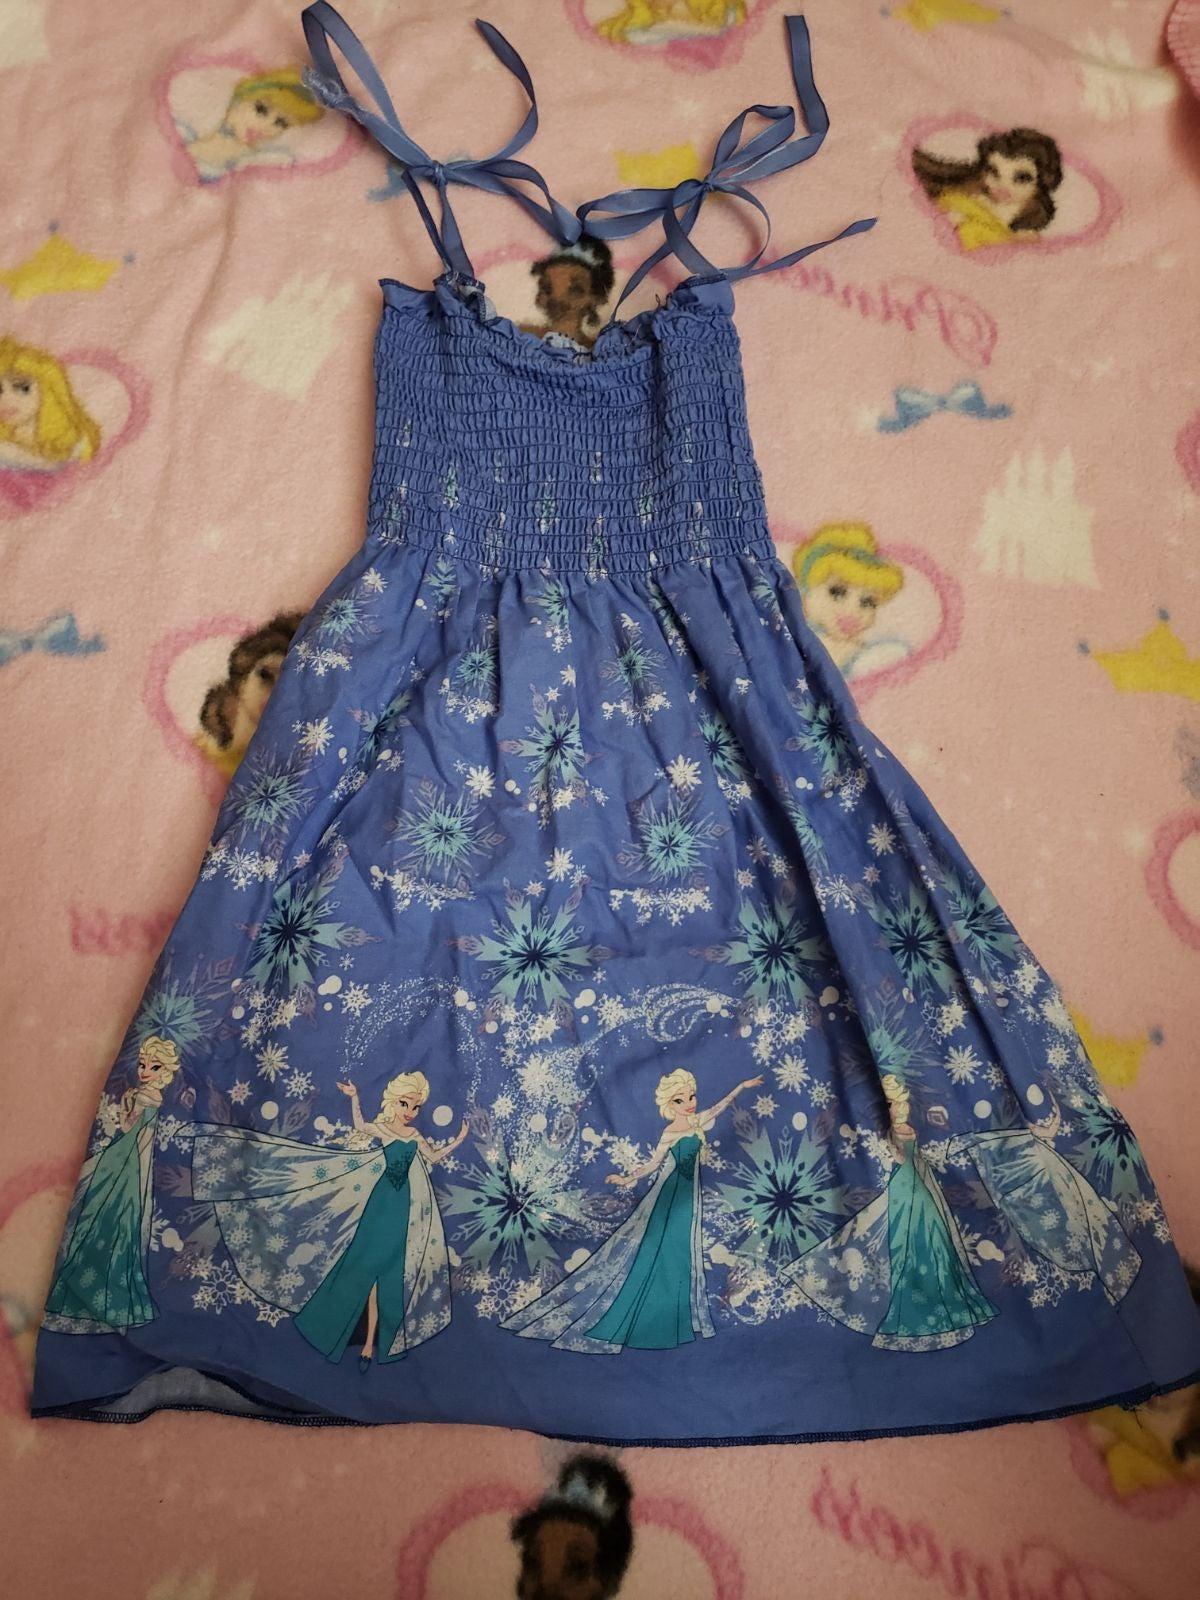 Frozen Elsa dress 3 to 4t